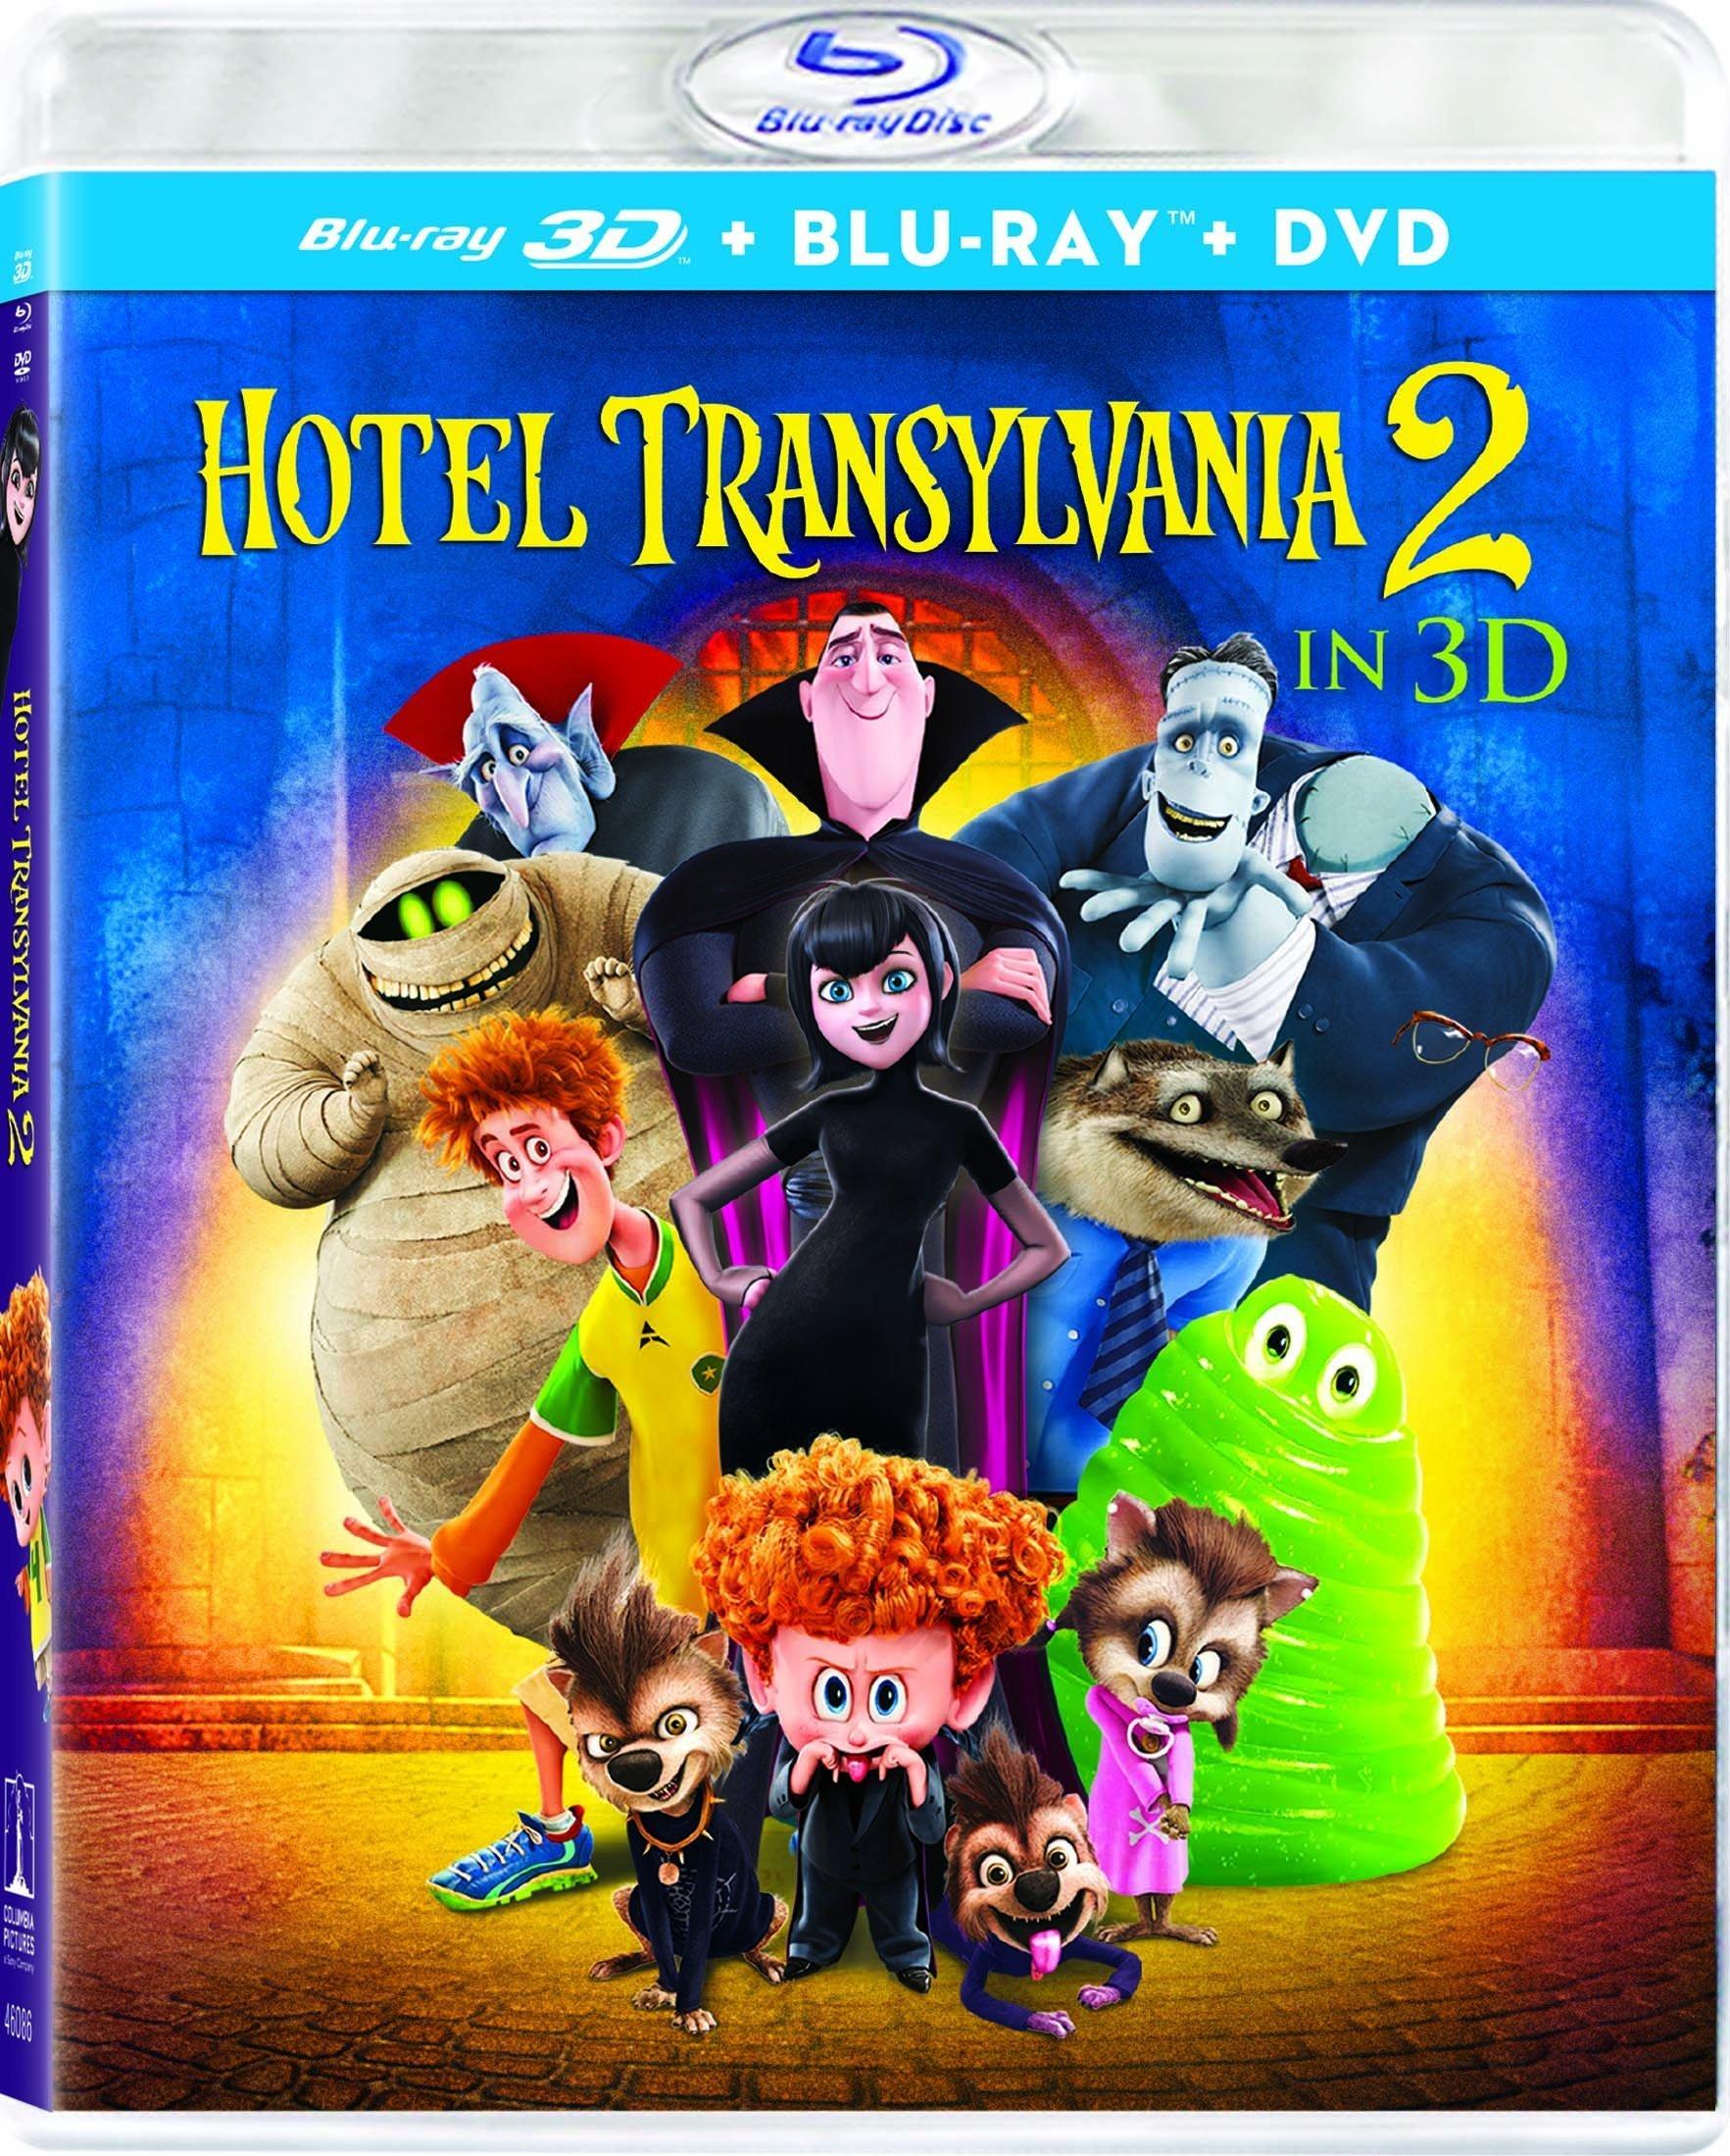 Hotel Transylvania 2 3D (2015) Blu-ray 3D